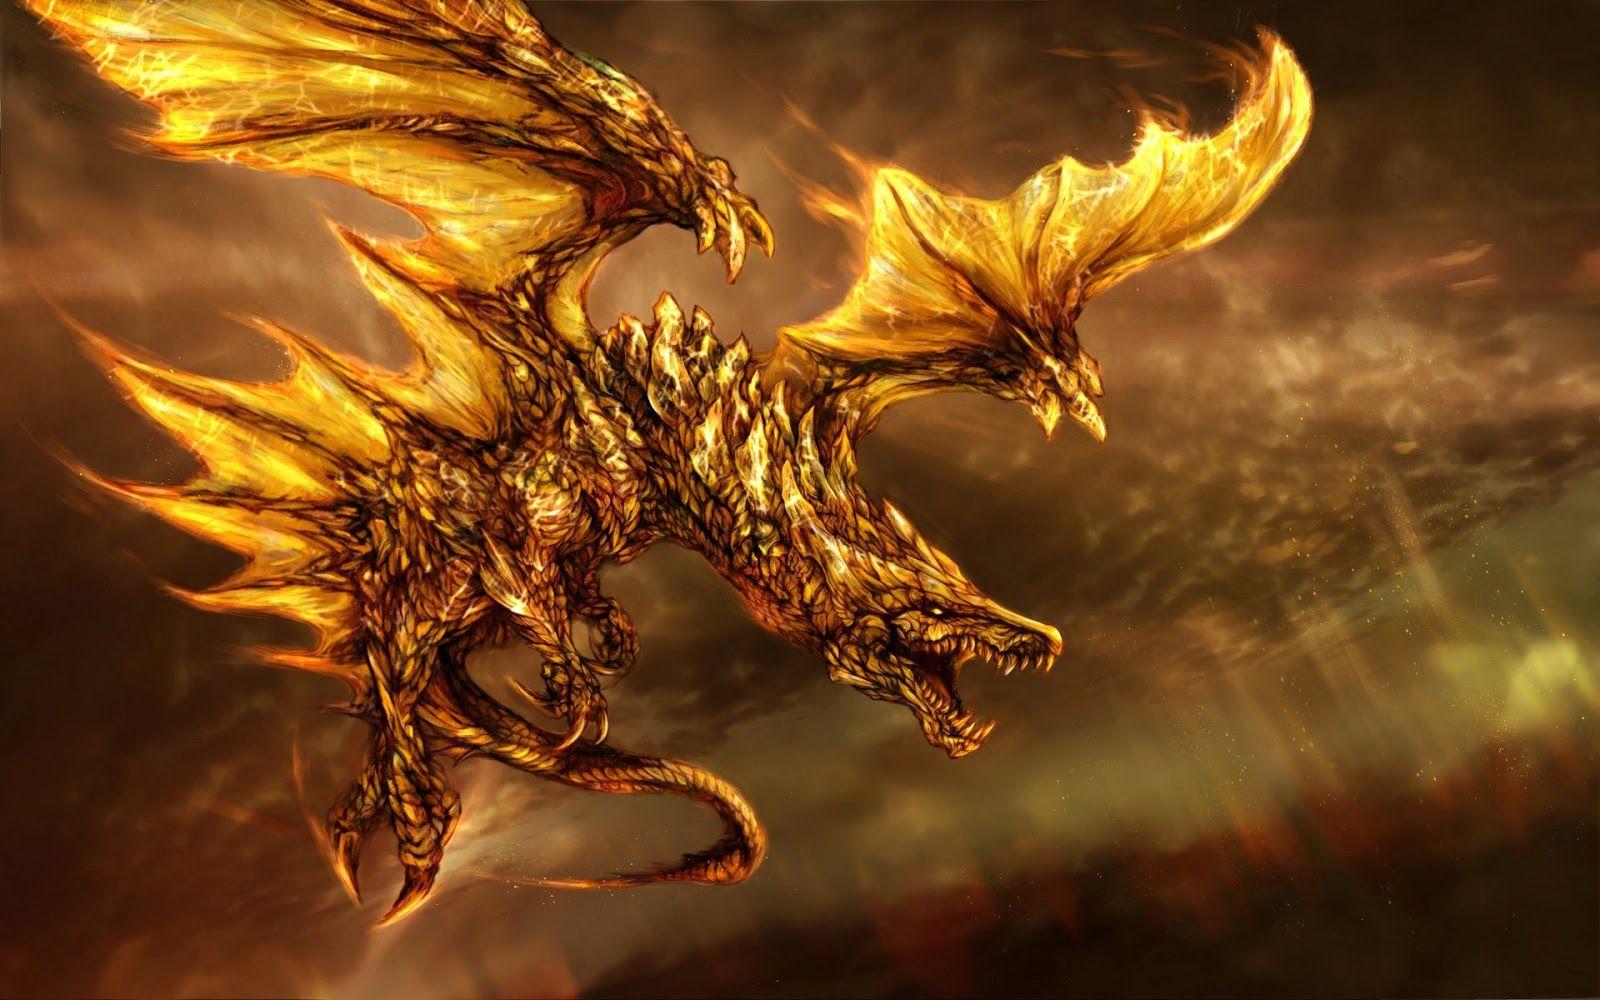 Fire Dragon Hd Wallpaper In 2020 Fire Dragon Fire Breathing Dragon Creature Artwork